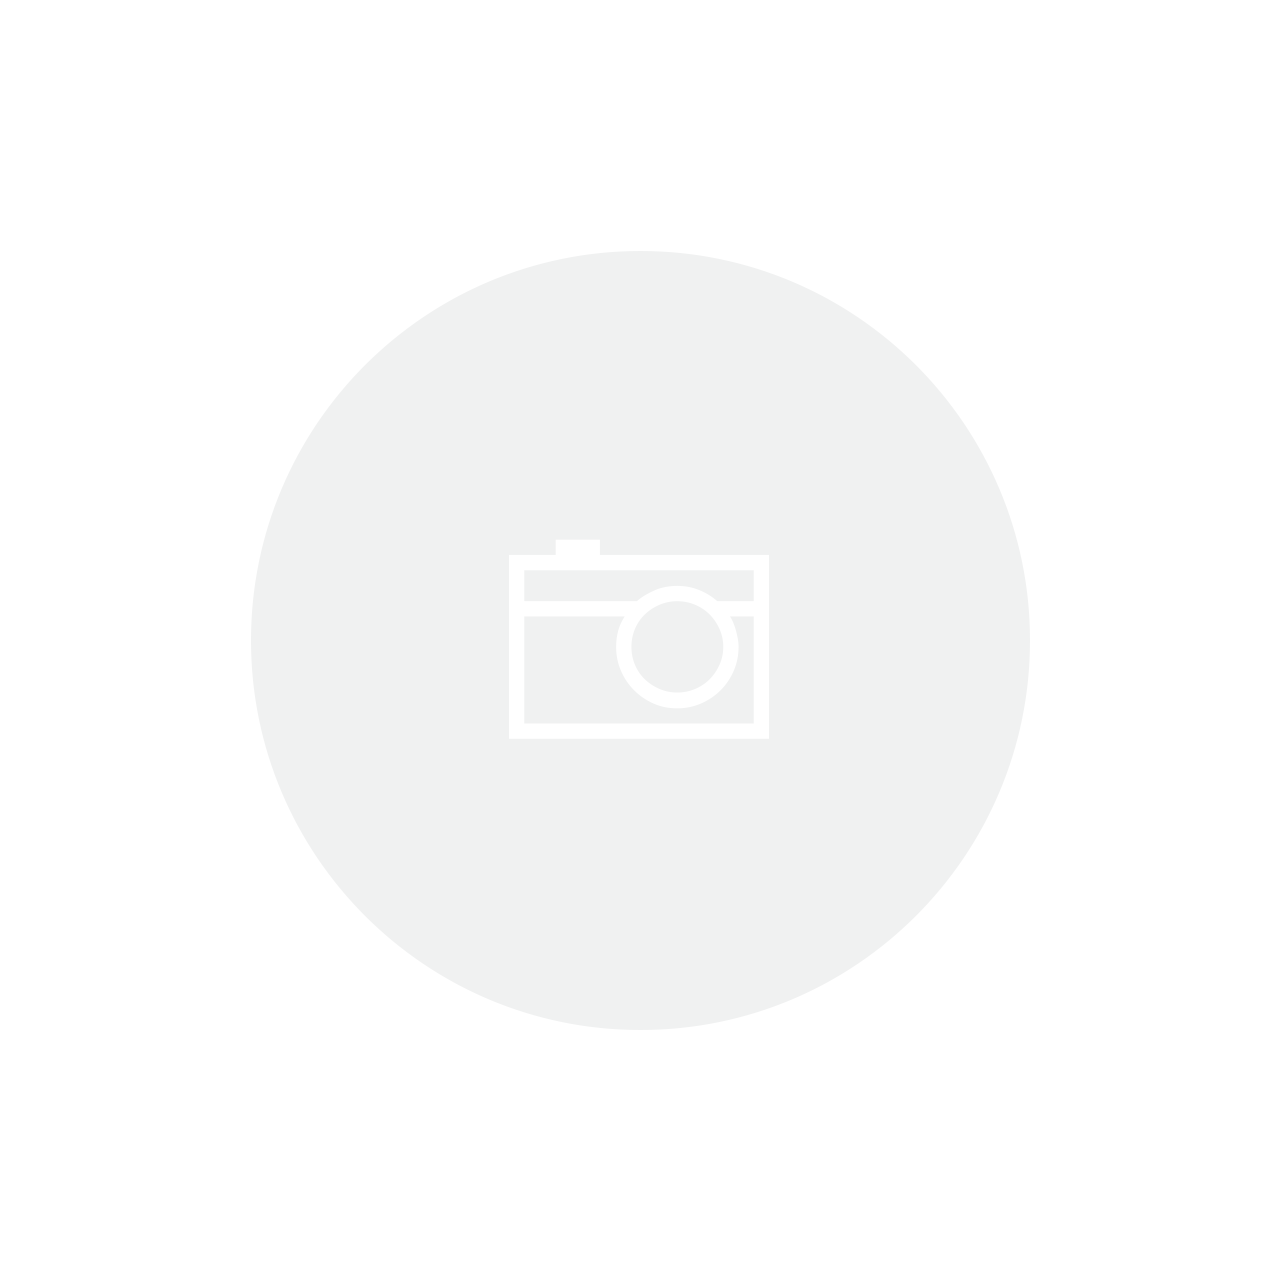 Placa Horizontal 4x4 - 2 módulos separados